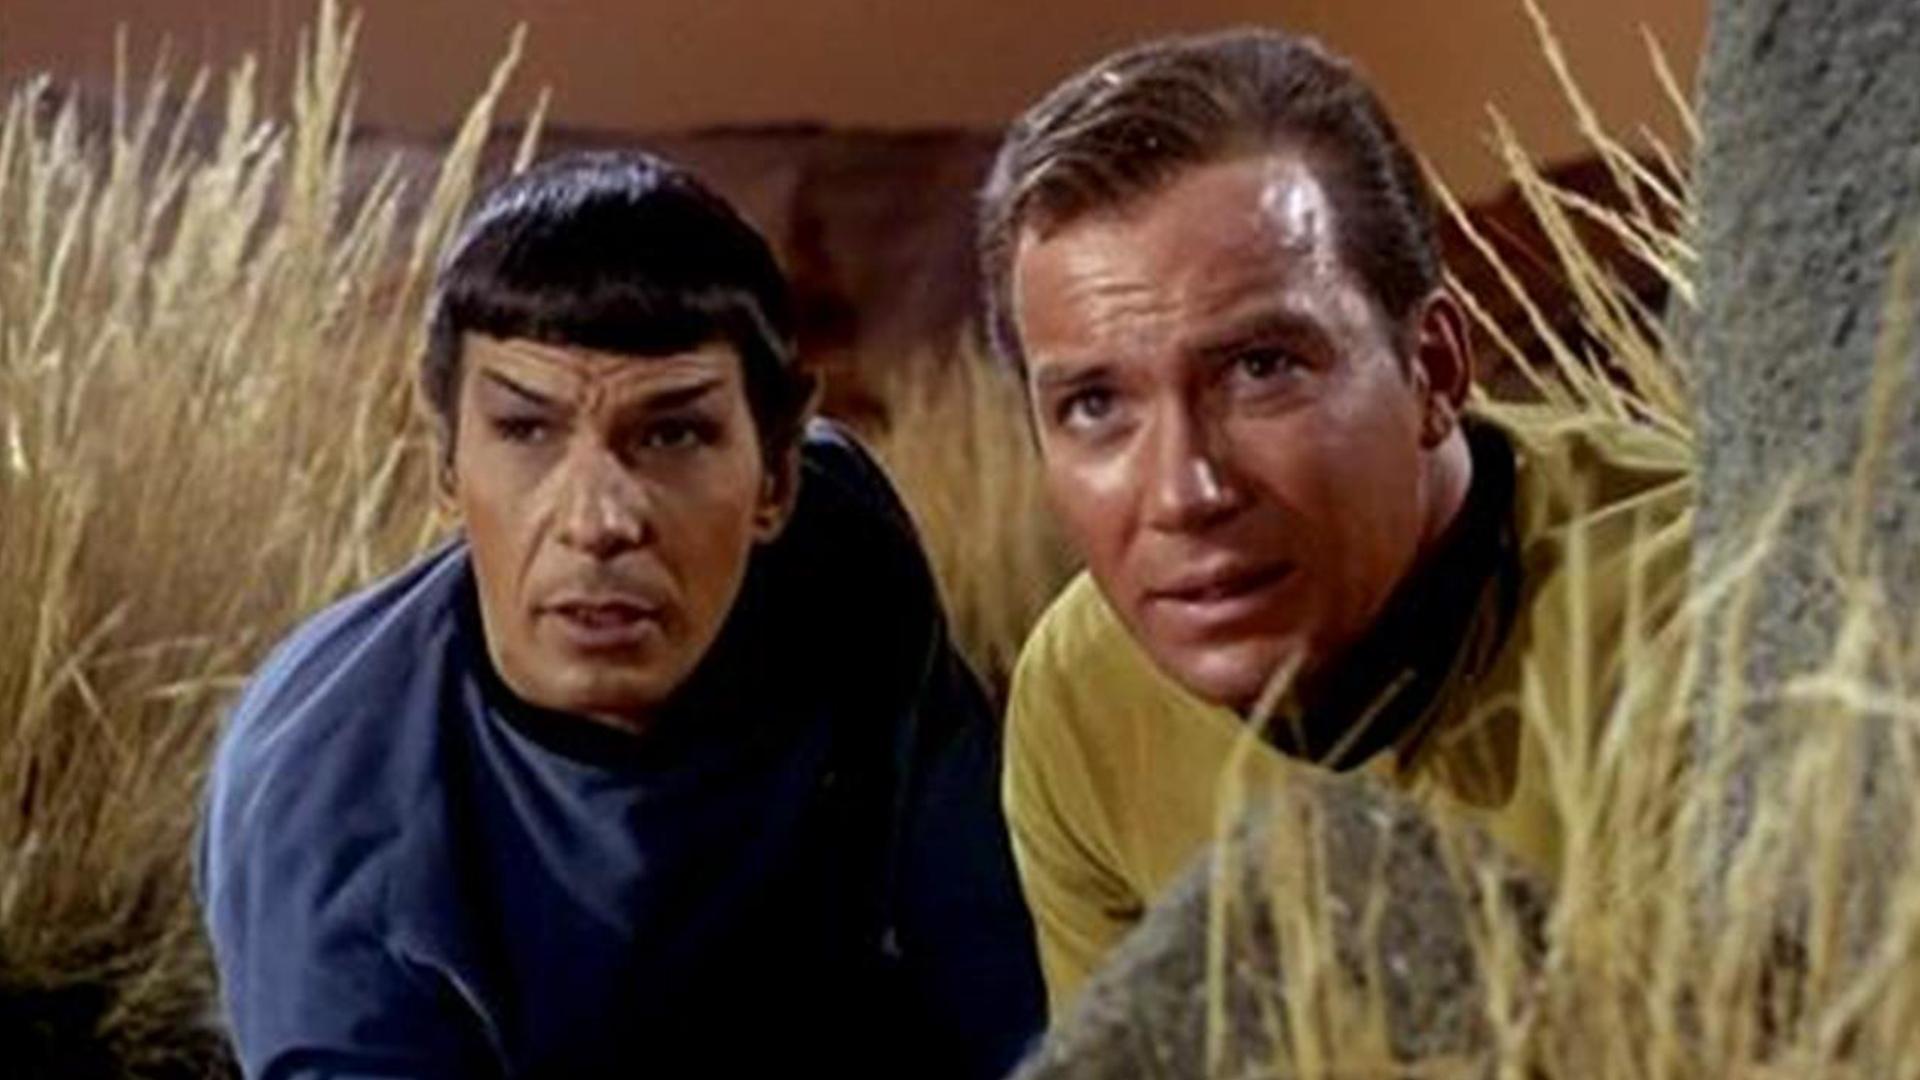 Watch Star Trek: The Original Series (Remastered) Season 1 Episode 1: The  Man Trap - Full show on CBS All Access